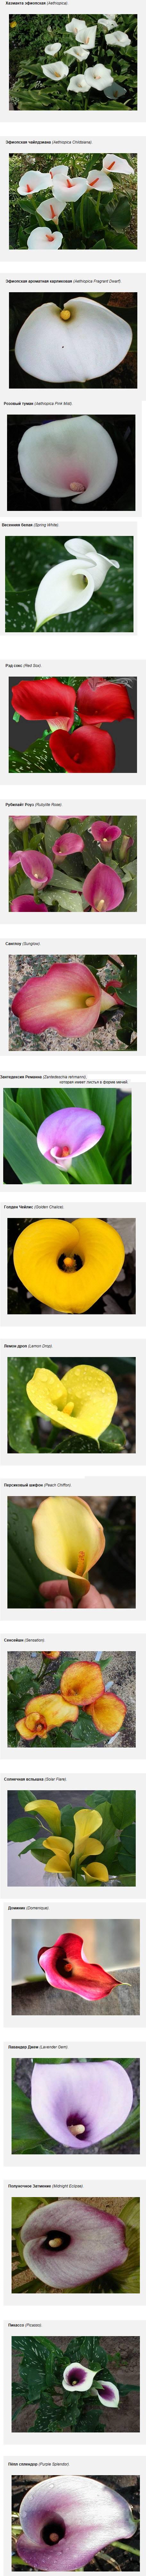 Кала цветы